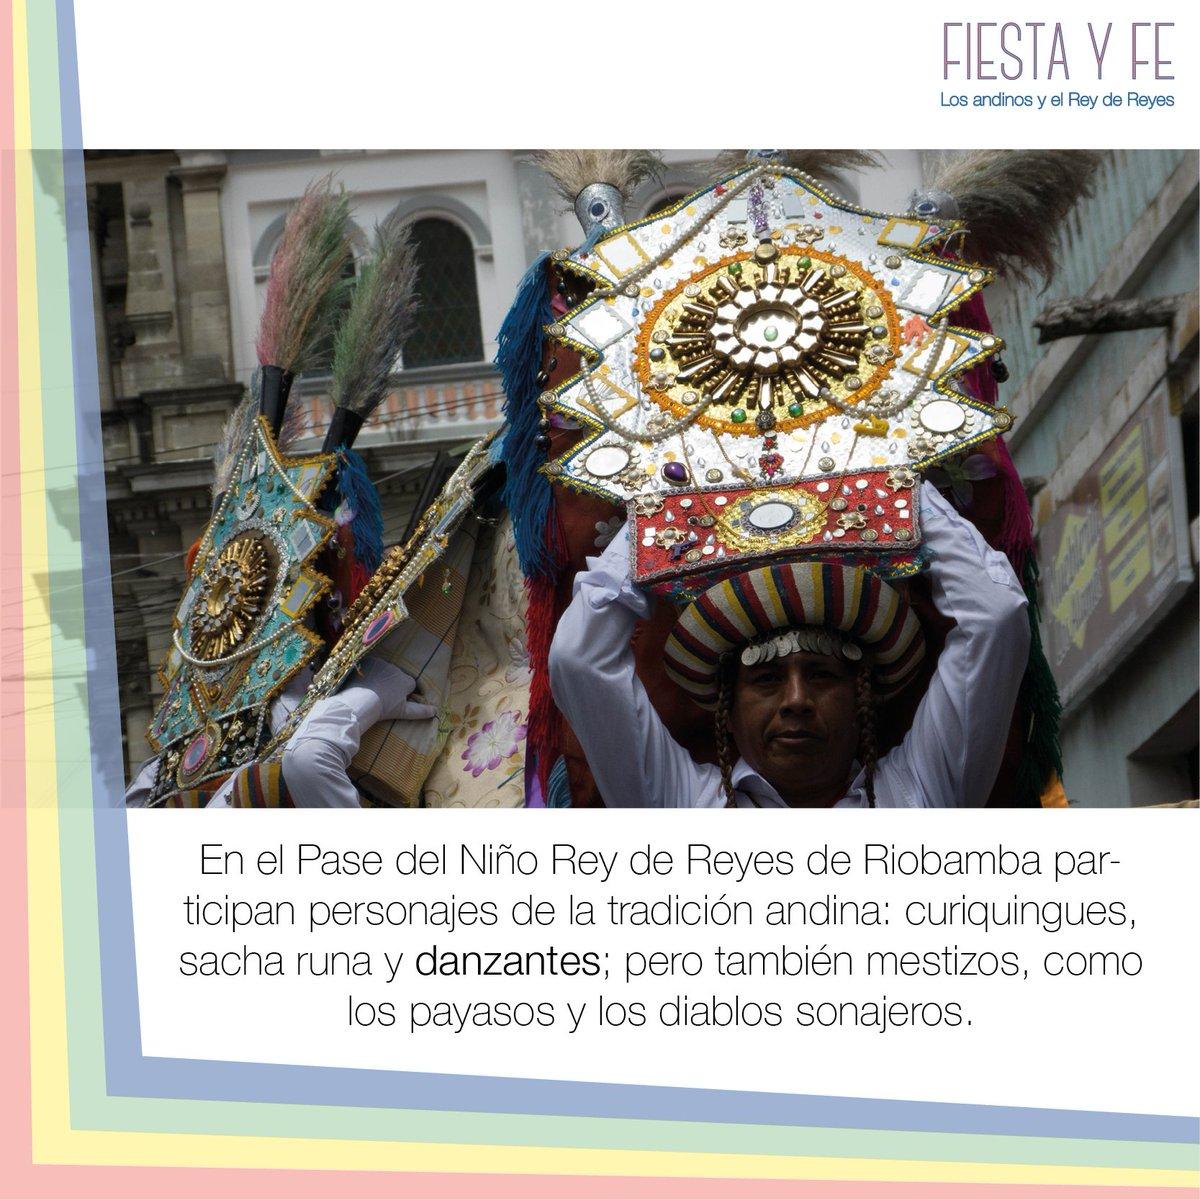 Fiesta y Fe